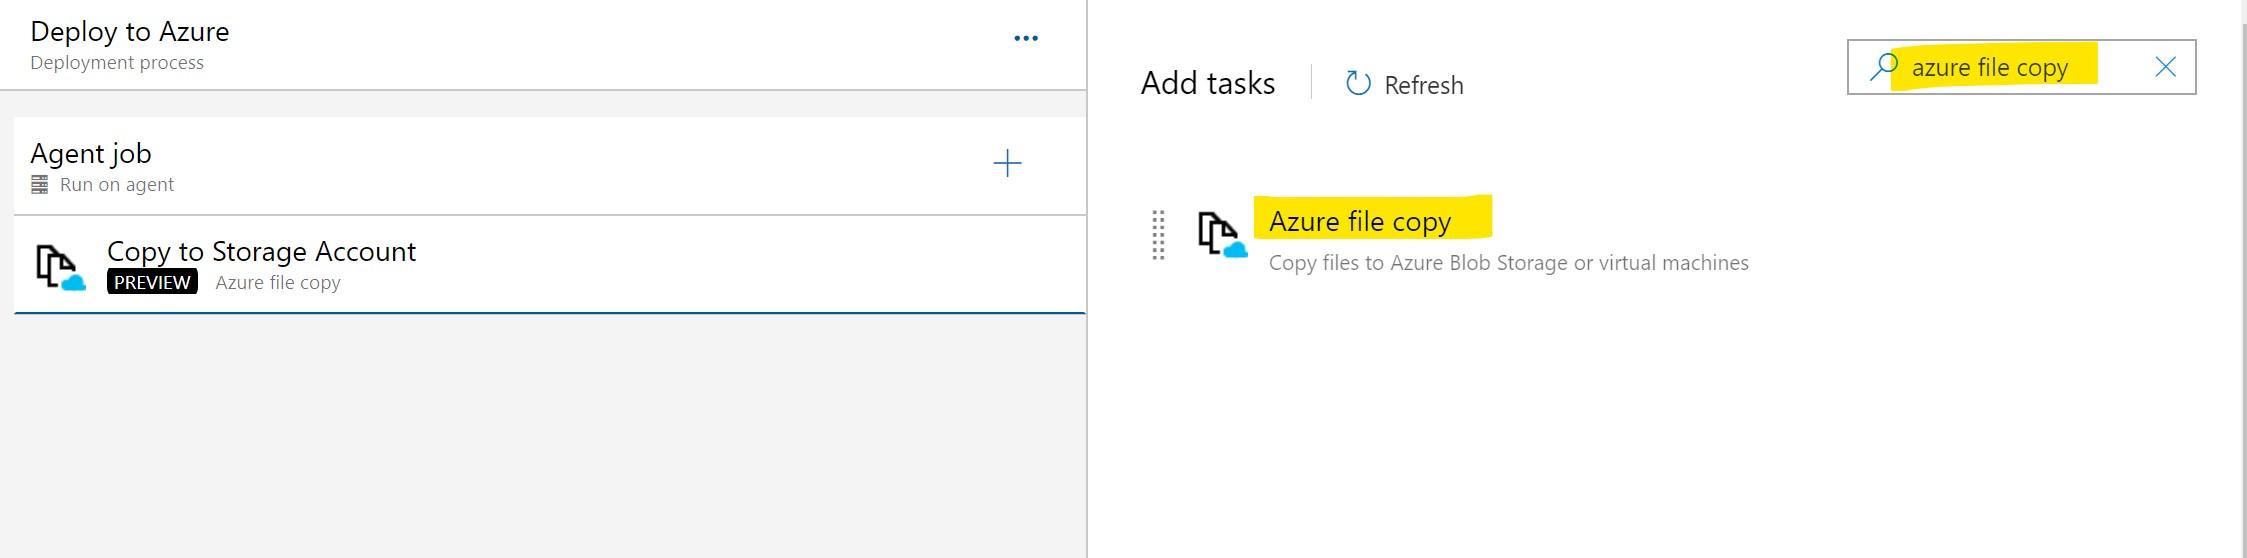 Create an Azure file copy task